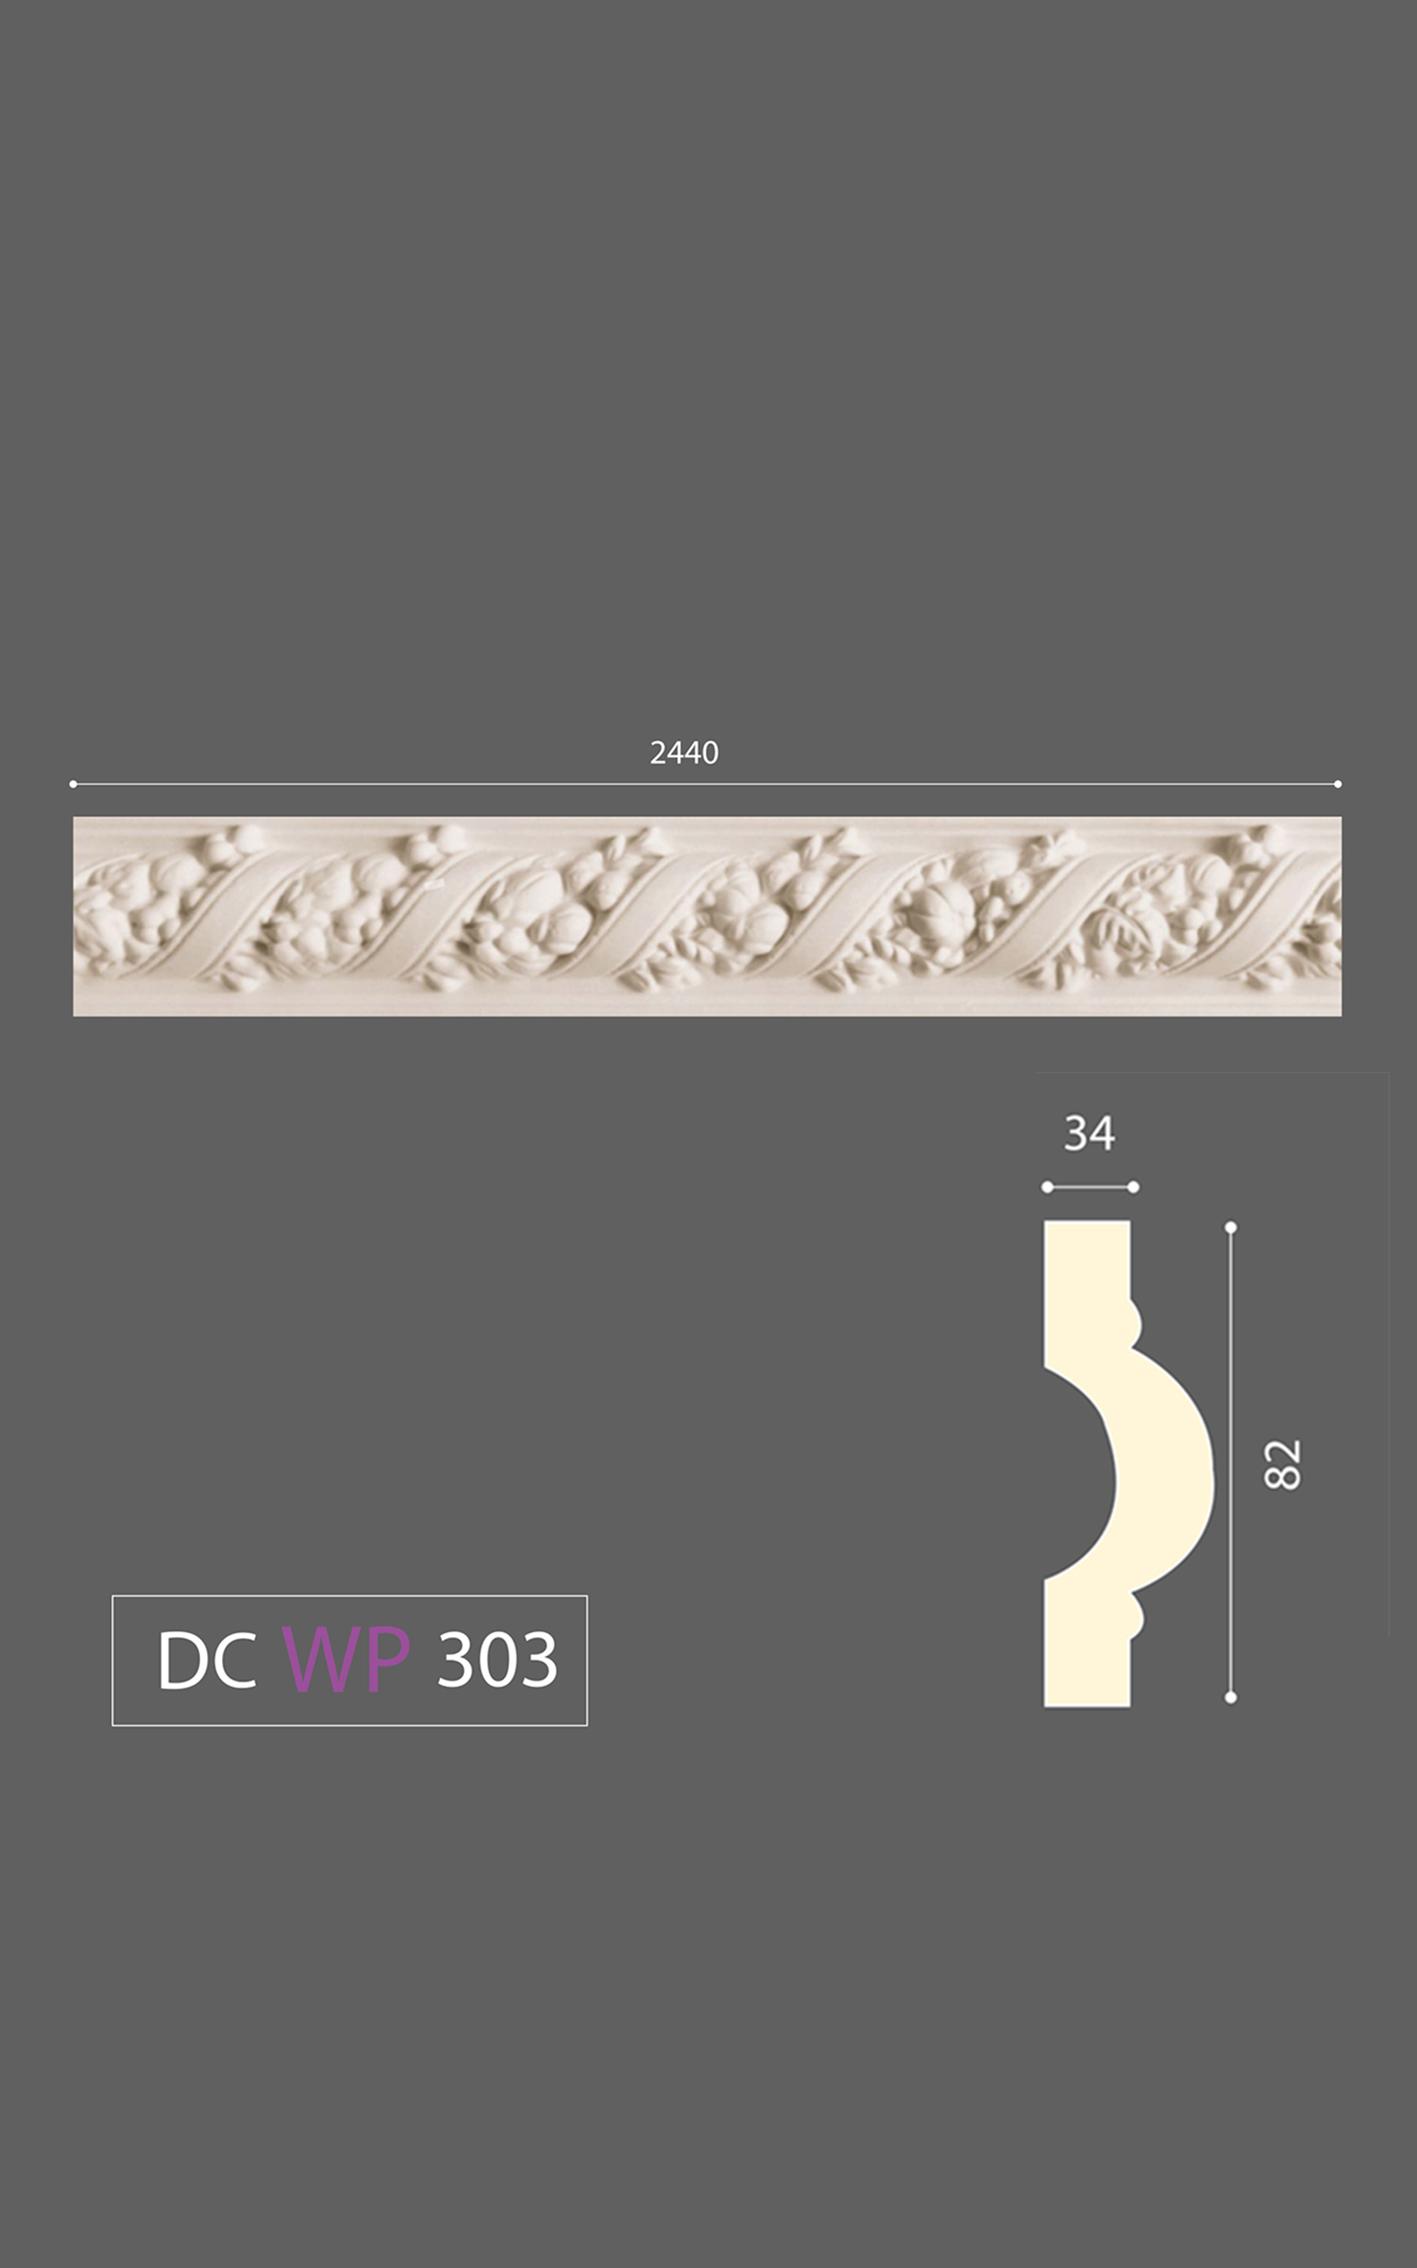 WP 303